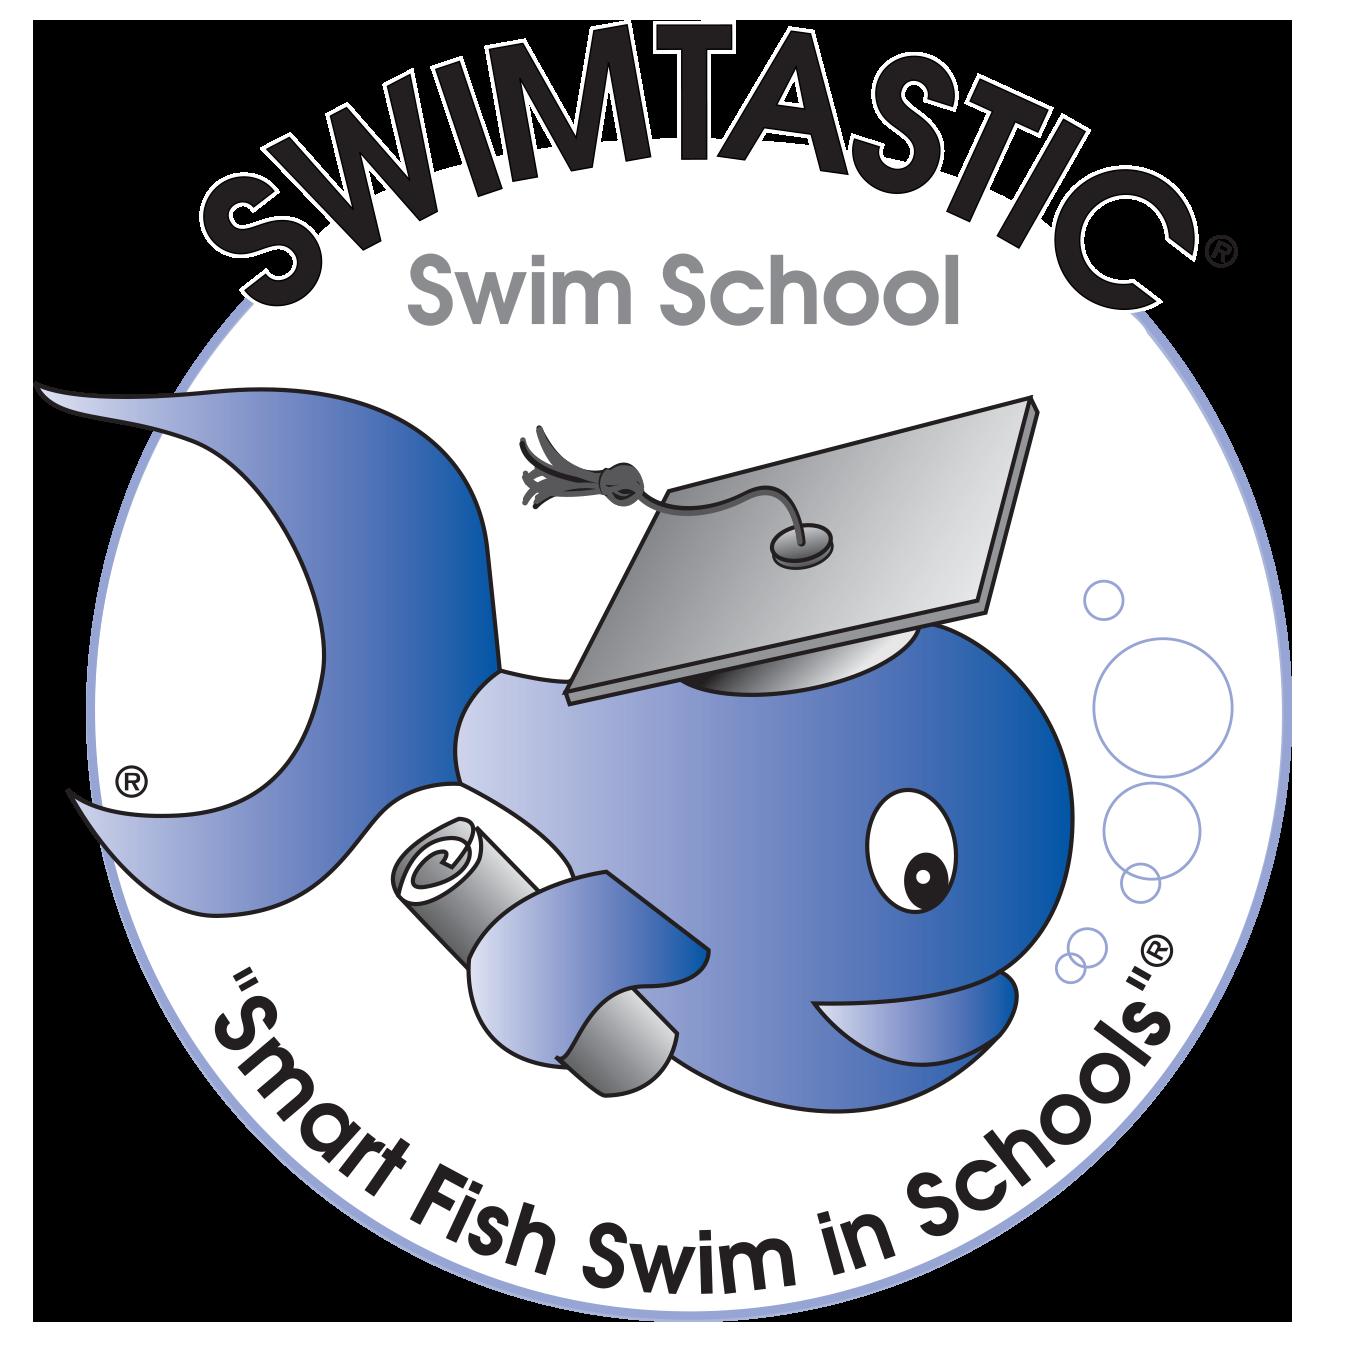 Swimtastic_Franchise_Image.png